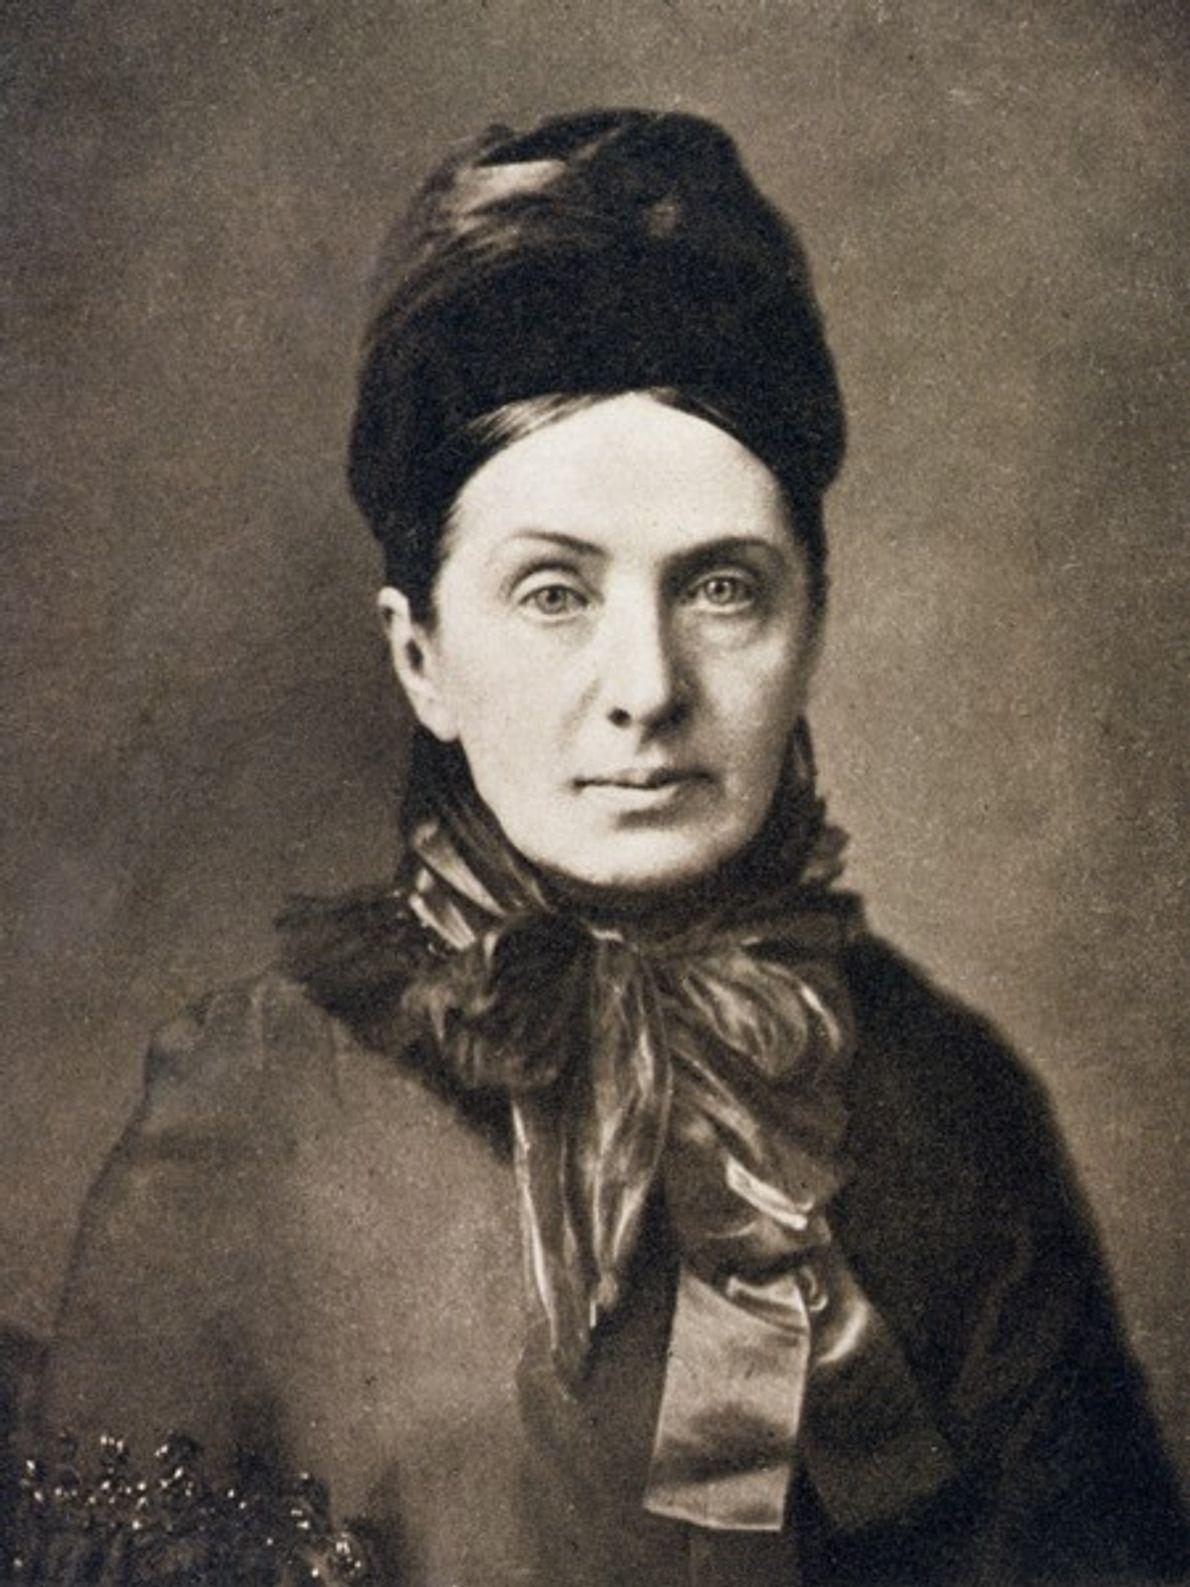 POR ALTOS VOOS: ISABELLA LUCY BIRD (1831–1904)